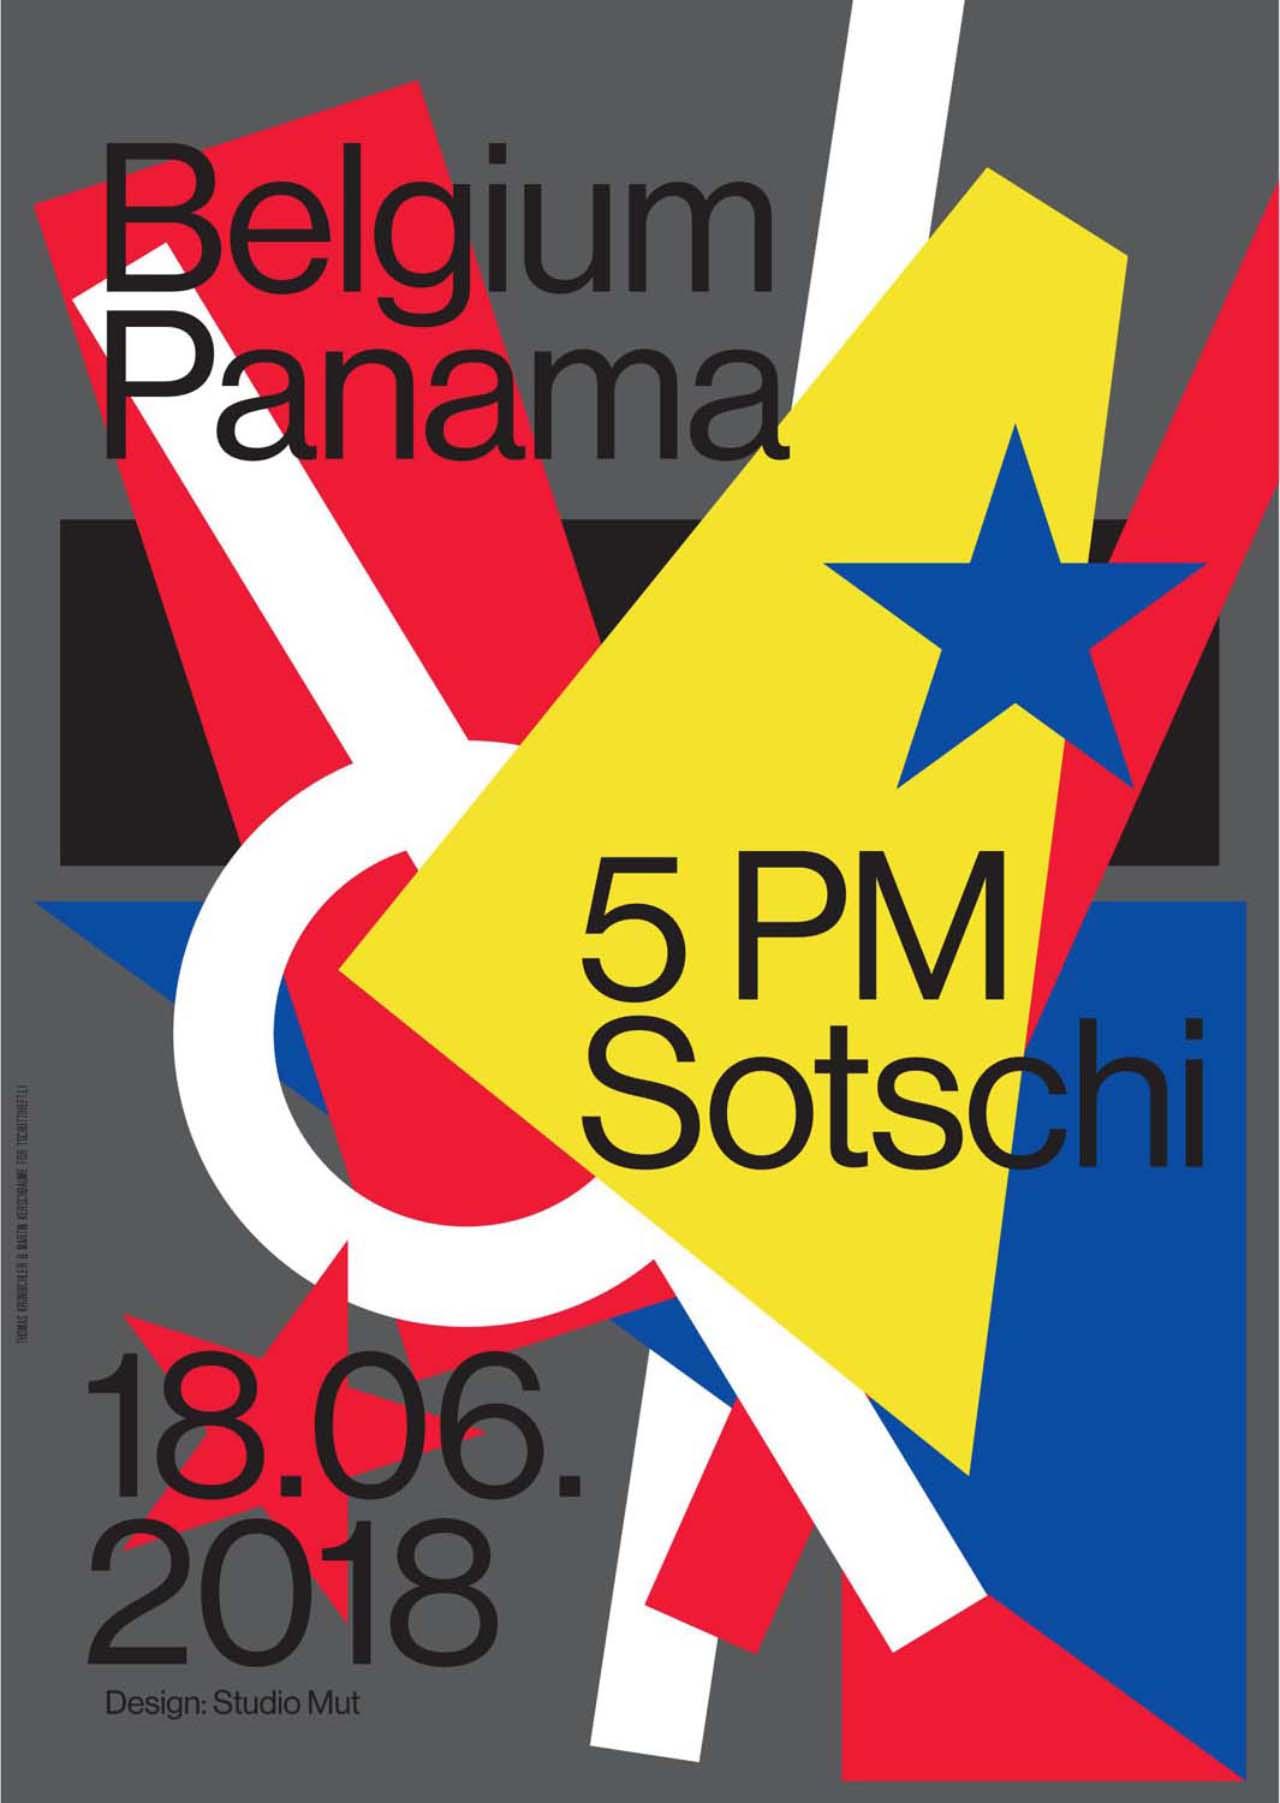 Tschutti Heftli Matchplakat Belgien Panama